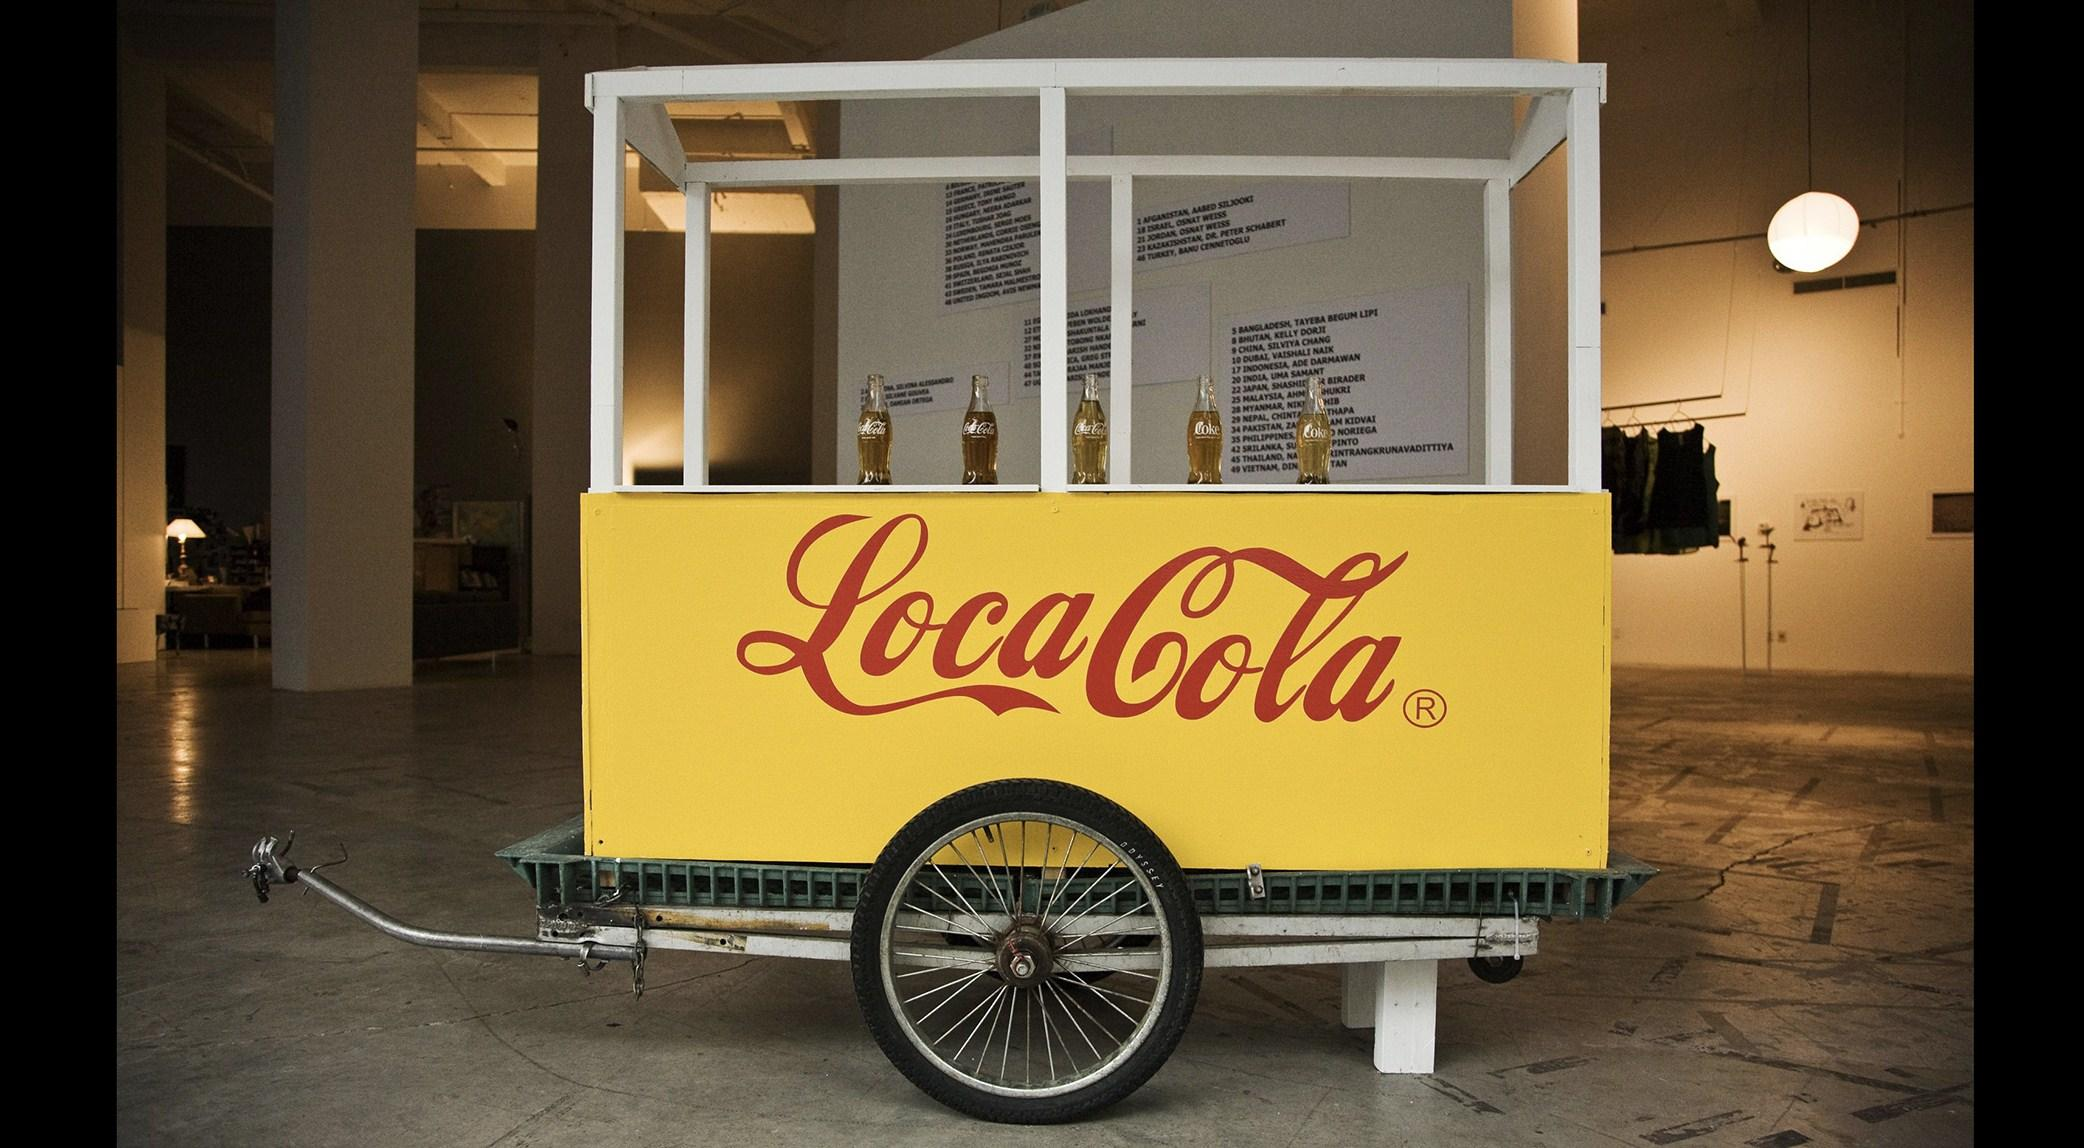 Mostra-Gola-triennale-Loca-Cola